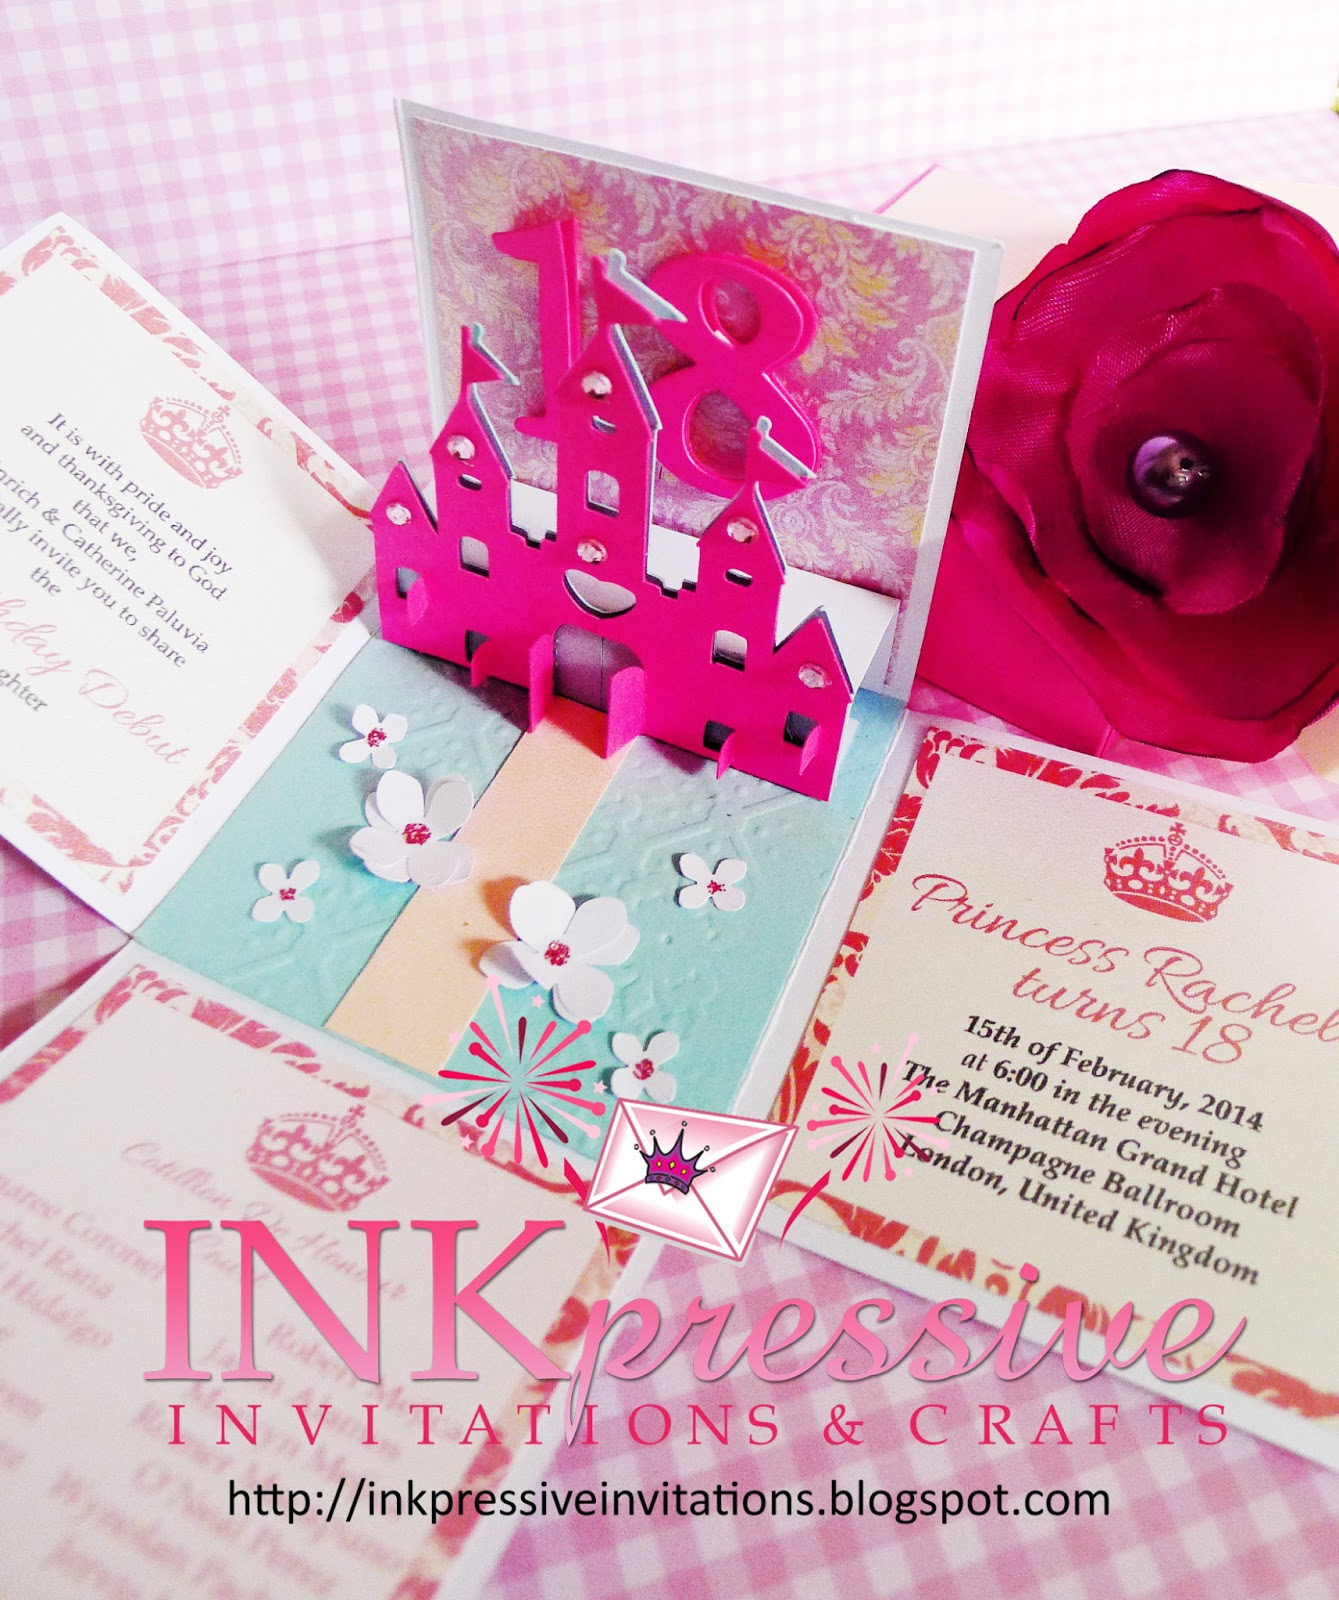 INKPRESSIVE INVITATIONS June 2013